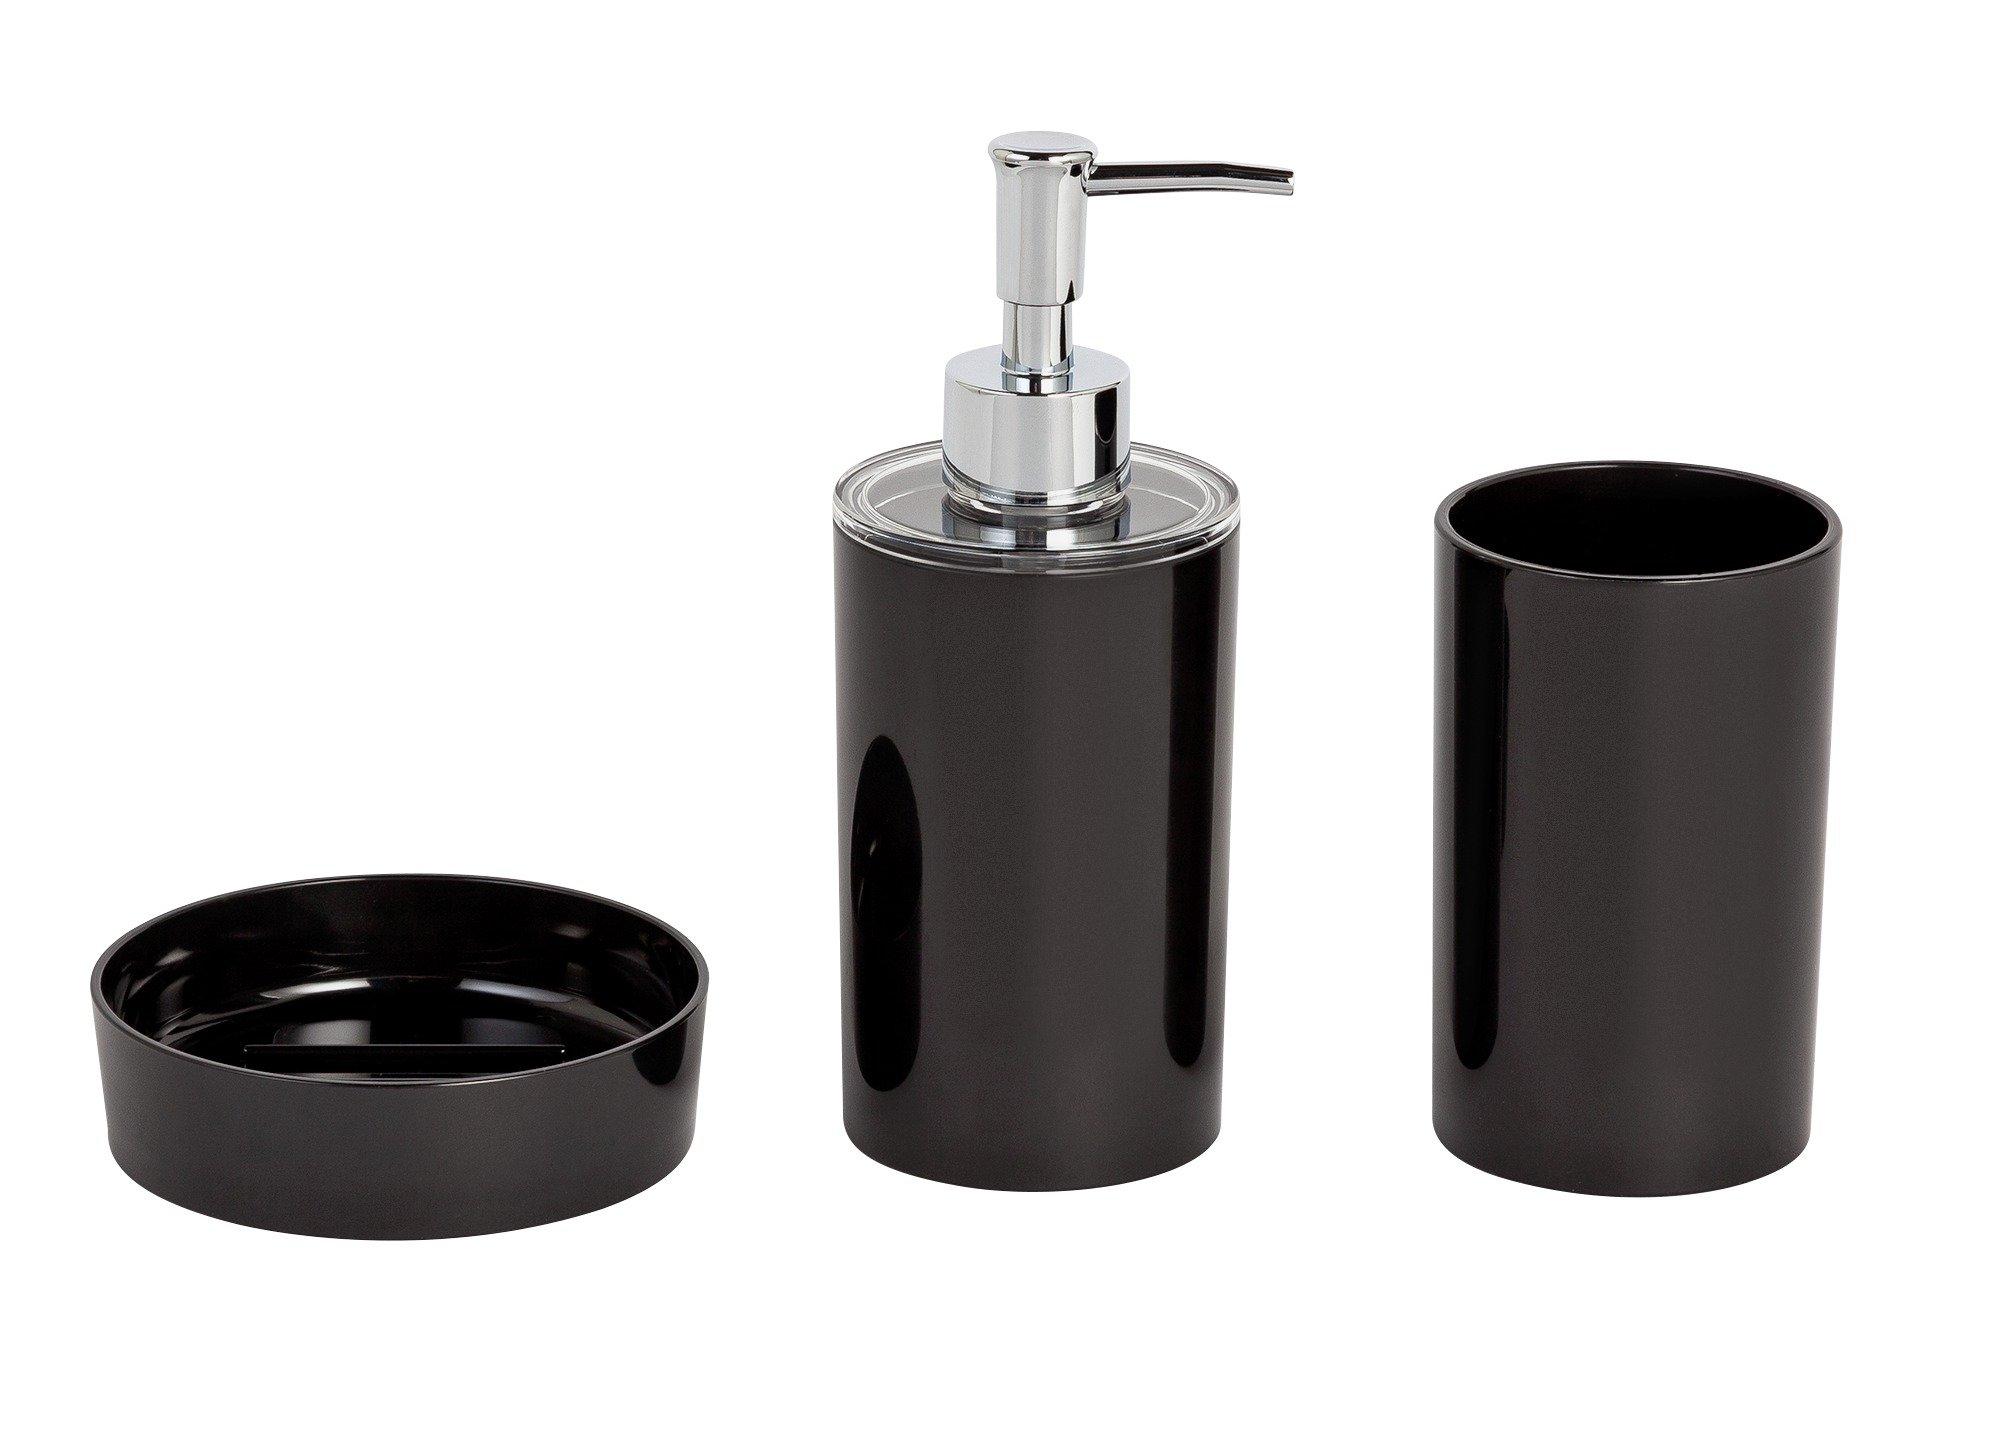 Black Bathroom Accessories Uk buy colourmatch 3 piece bathroom accessory set - black at argos.co